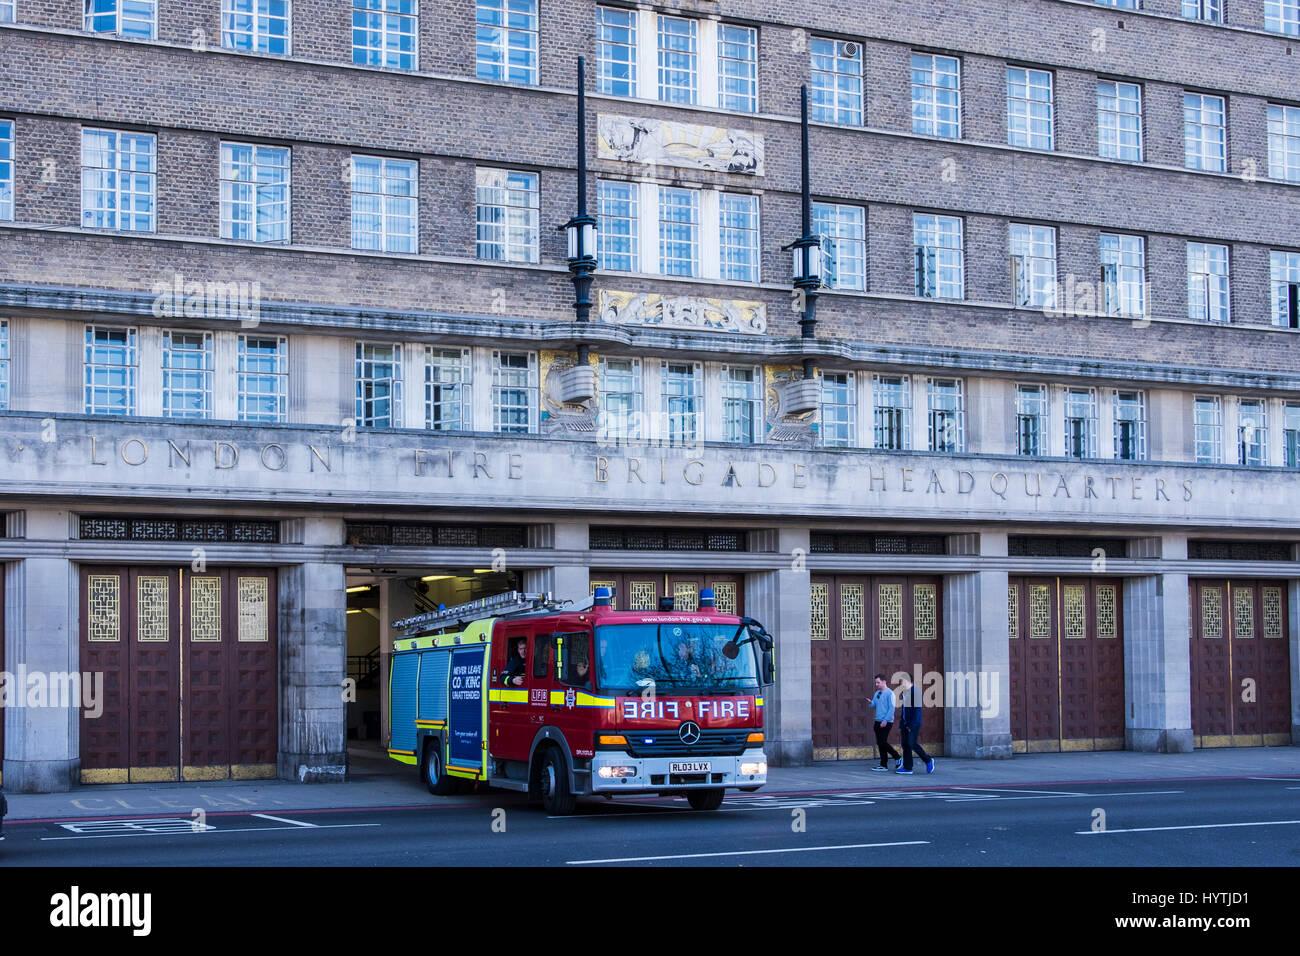 London Fire Brigade Headquarters, Lambeth, London, England, U.K. - Stock Image